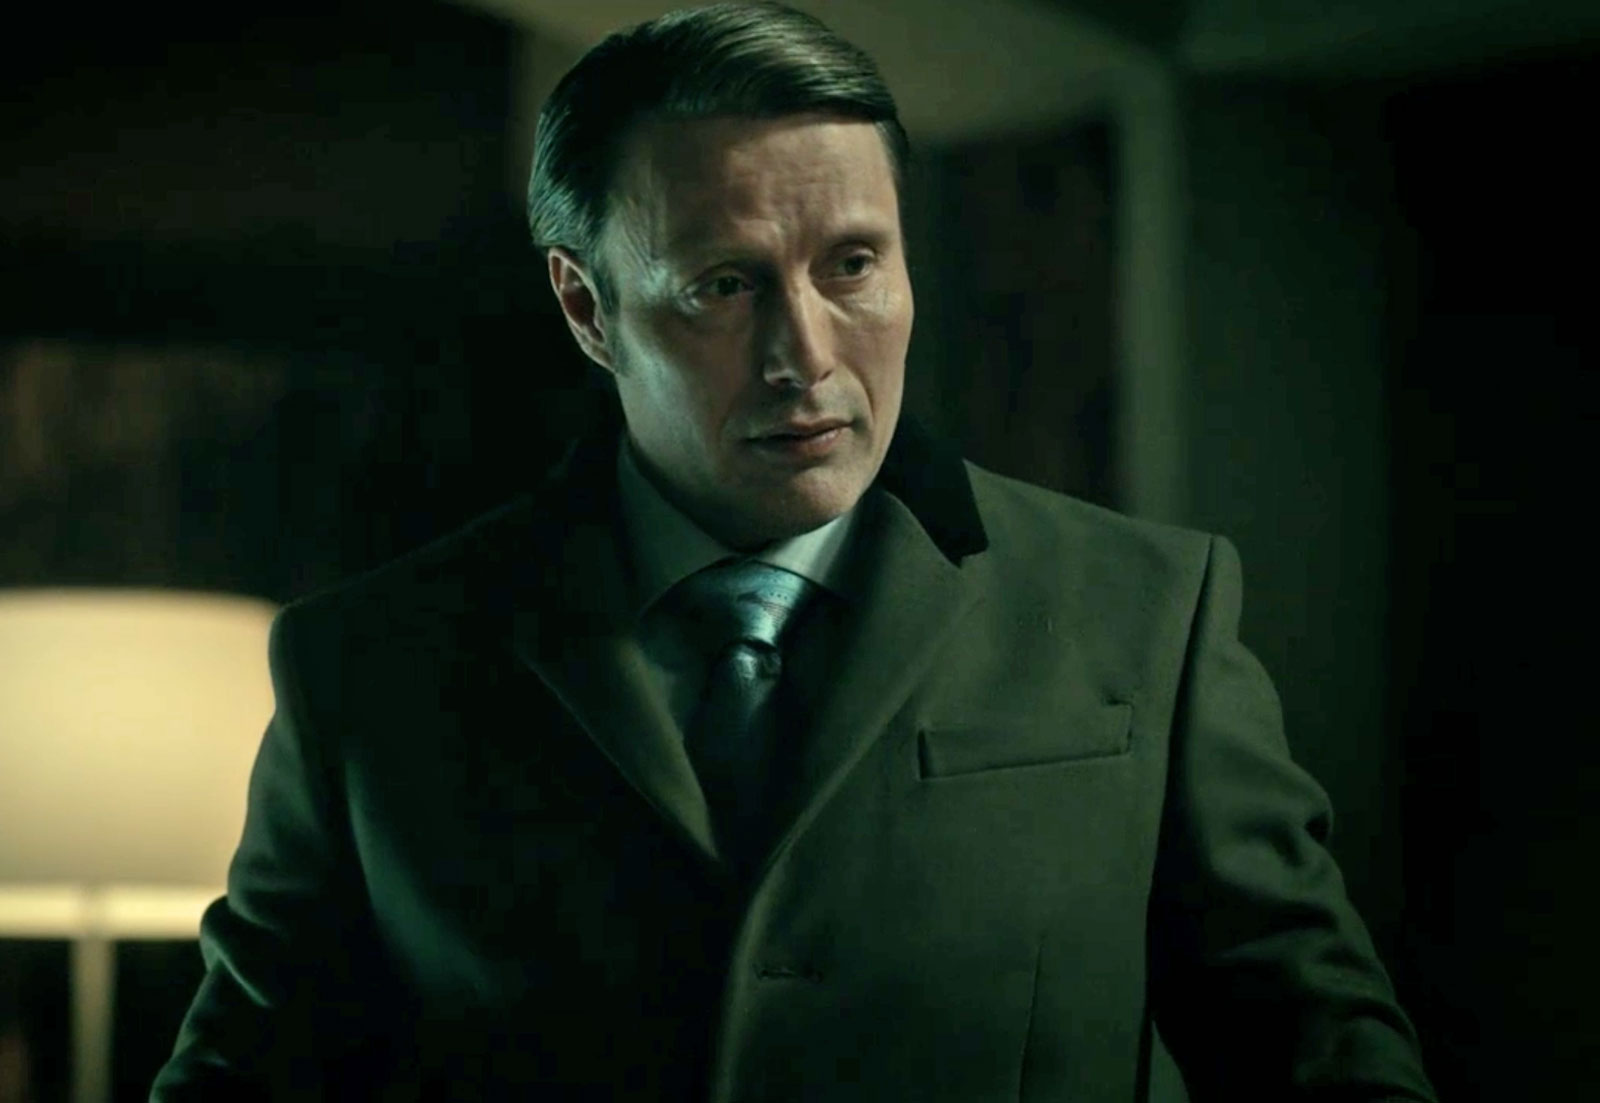 Burberry Overcoat on Hannibal